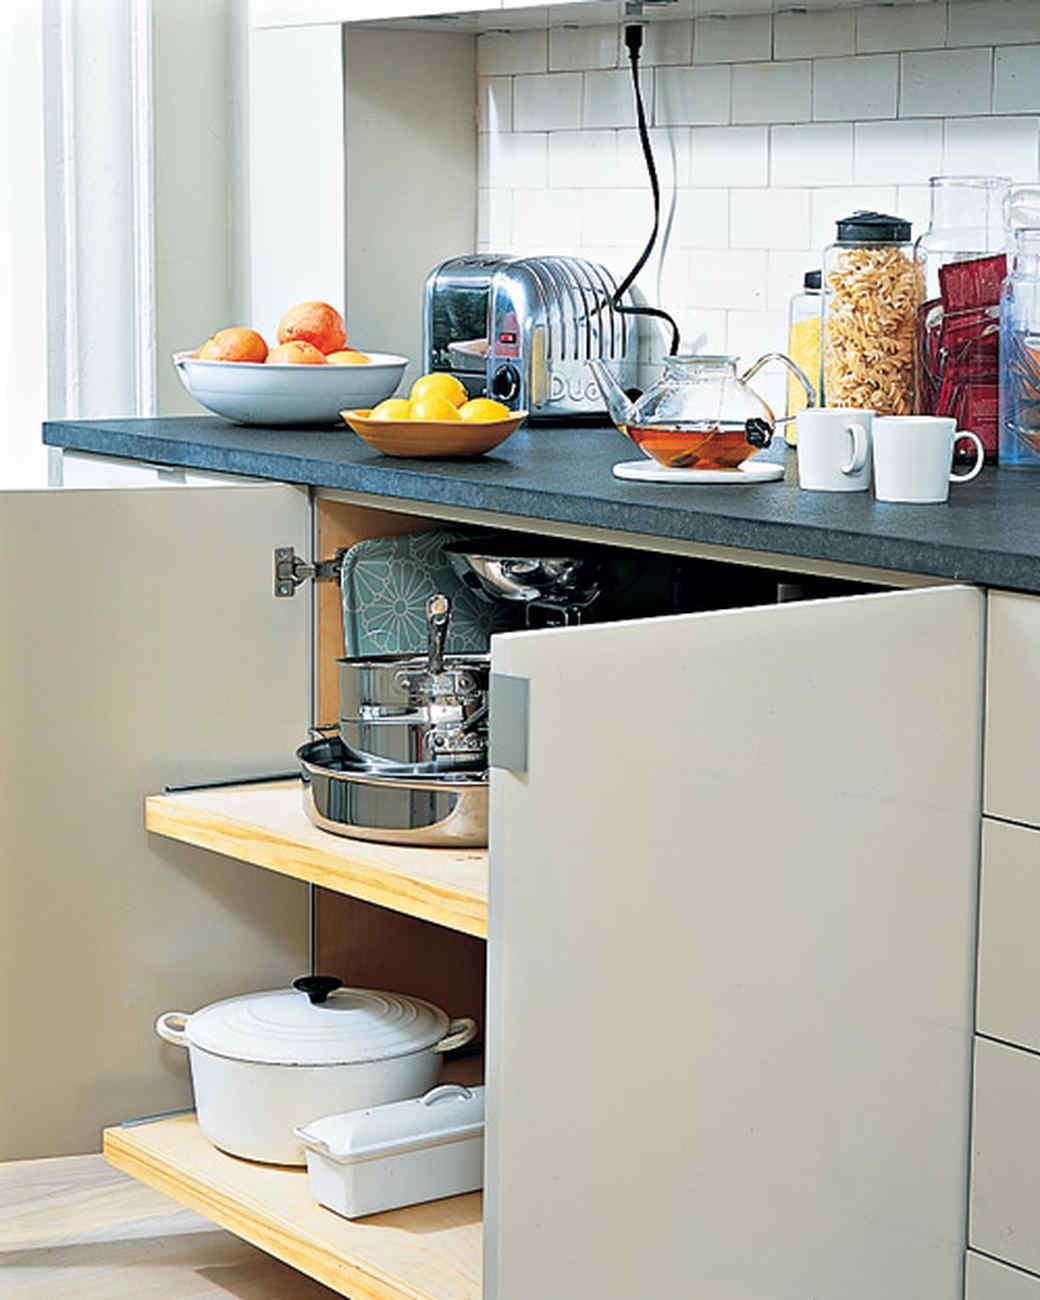 Organized Kitchen Cabinets: Organized Kitchens